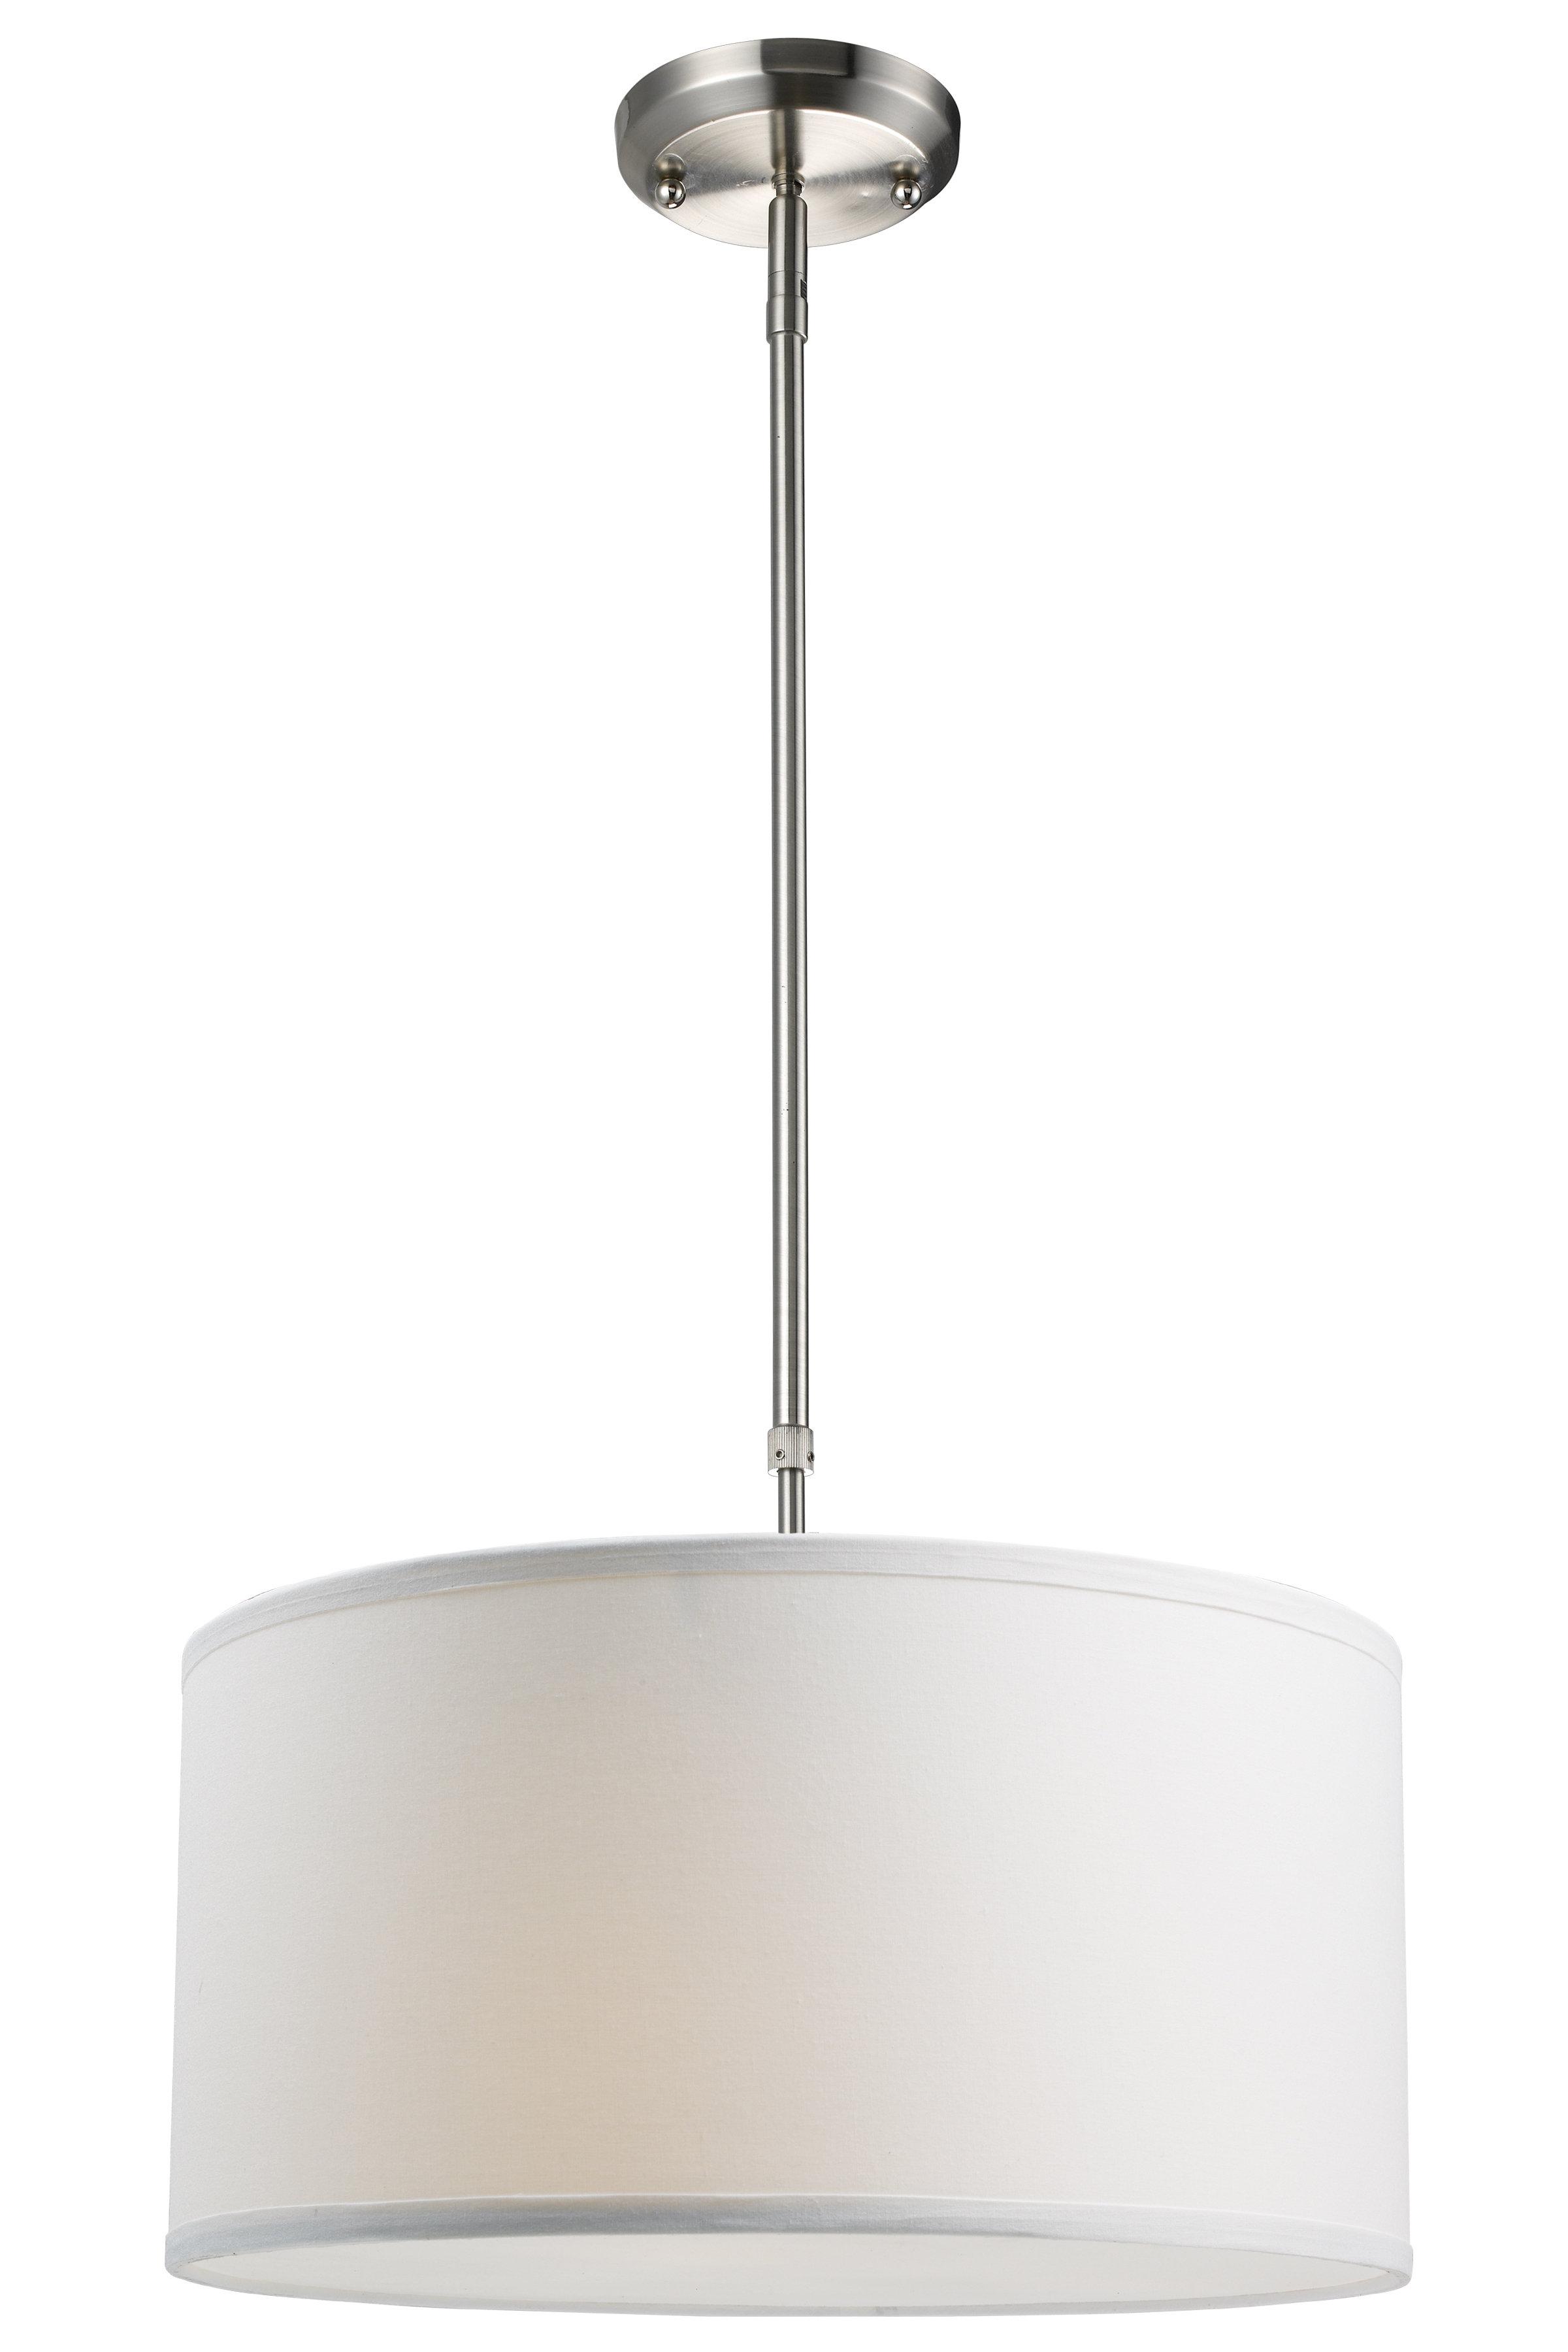 Featured Photo of Kasey 3 Light Single Drum Pendants